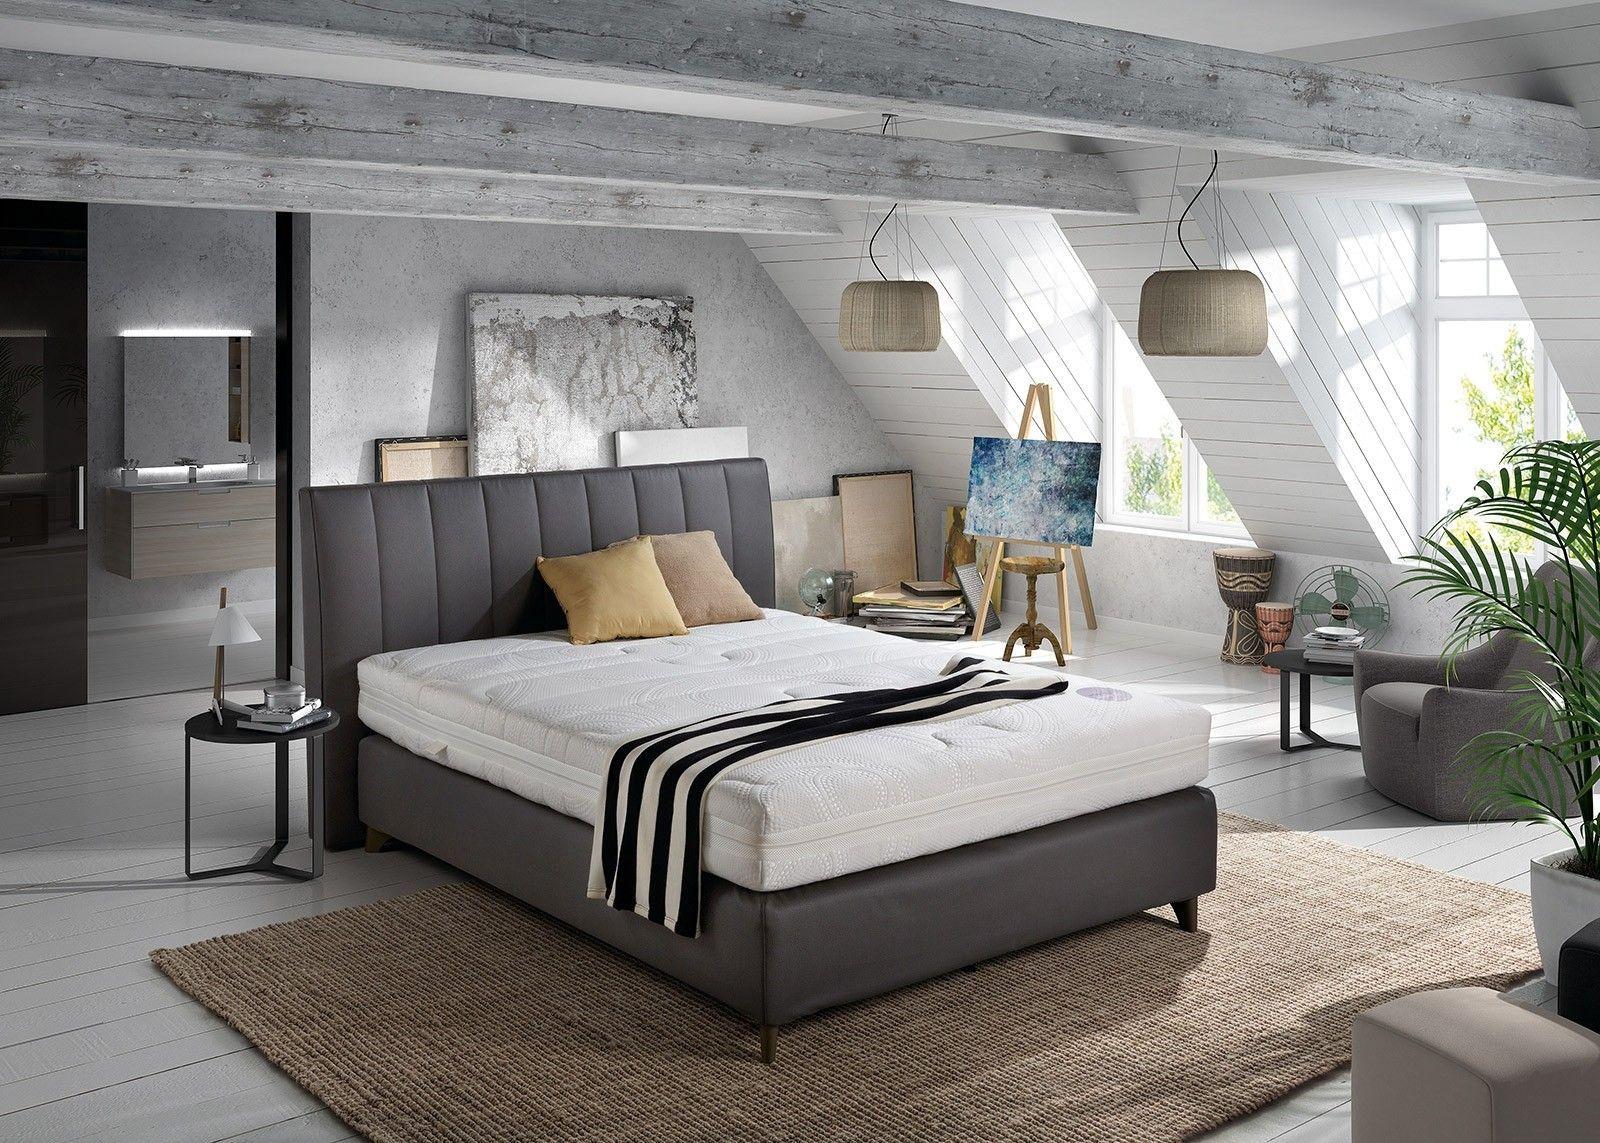 Decorating The Bedroom Master Bedroom Interior Design Master